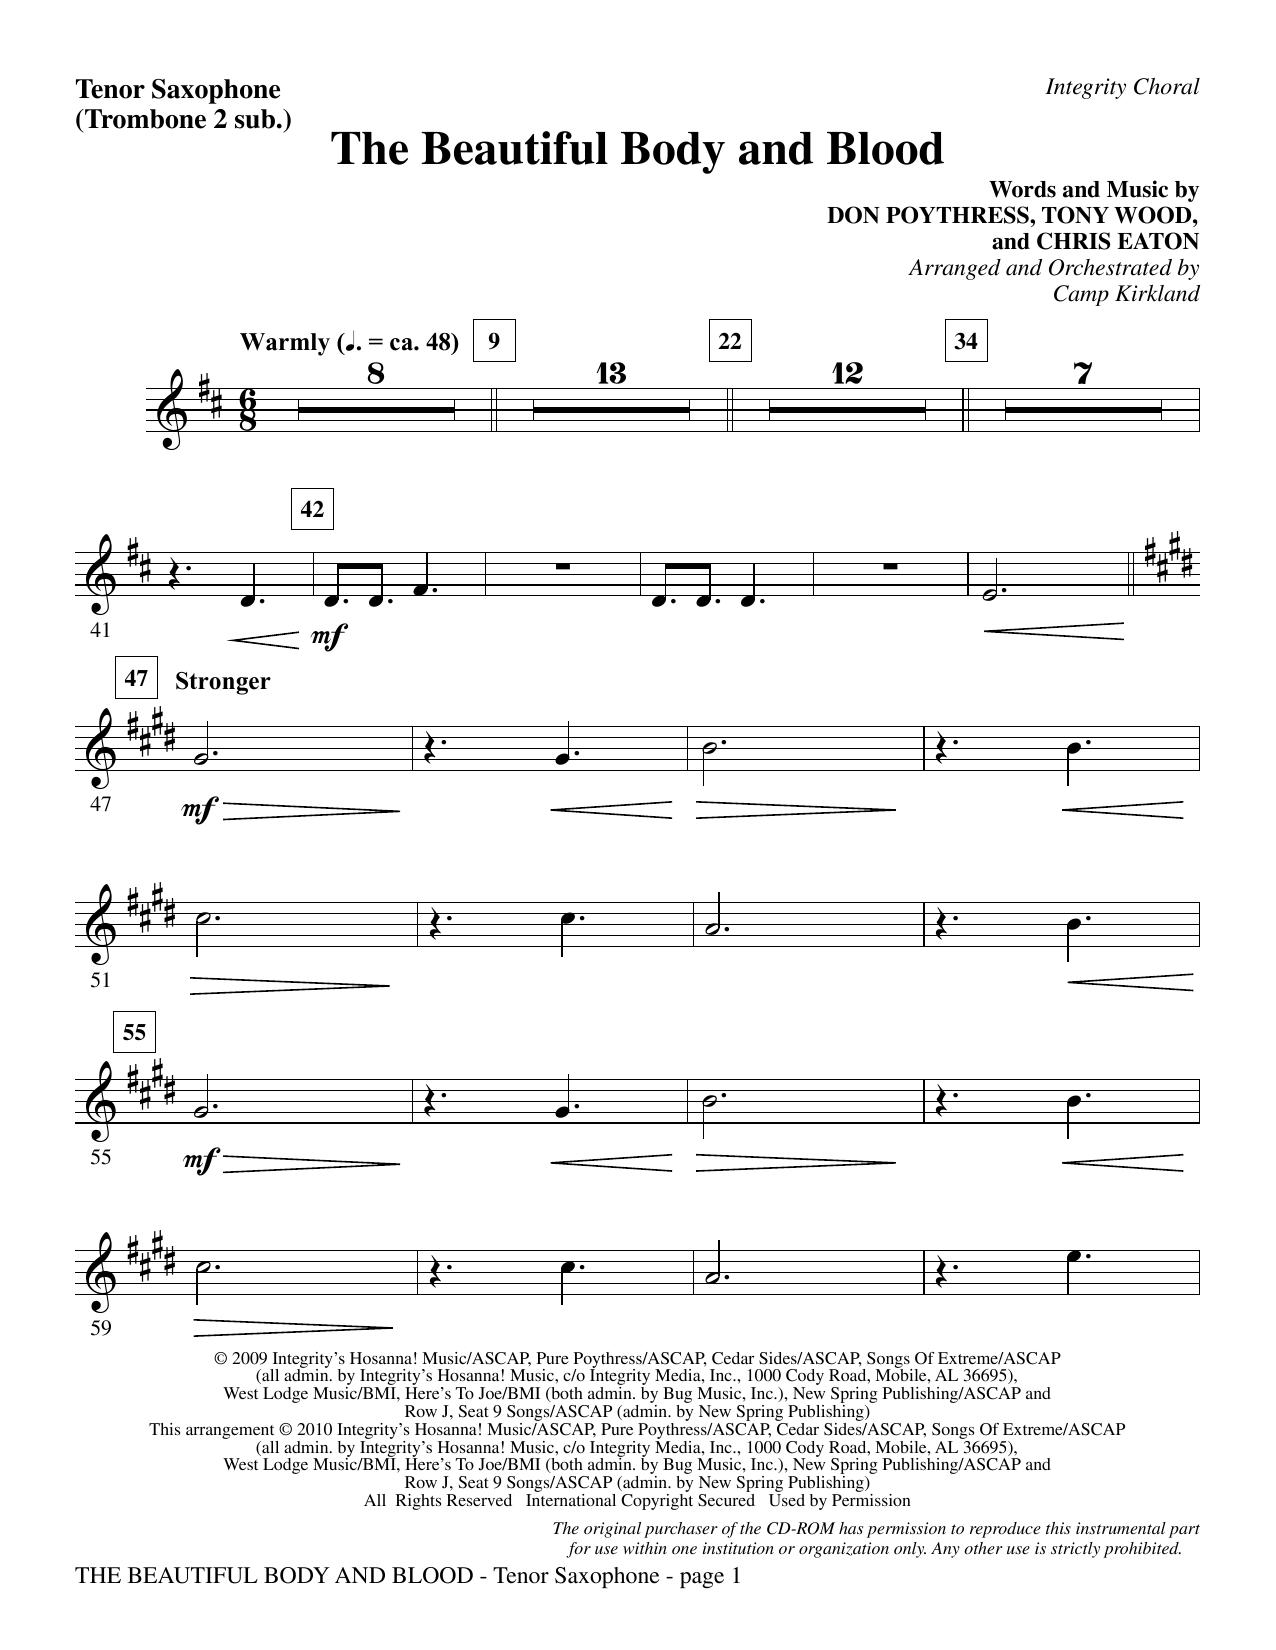 The Beautiful Body And Blood - Tenor Sax (sub. Tbn 2) (Choir Instrumental Pak)